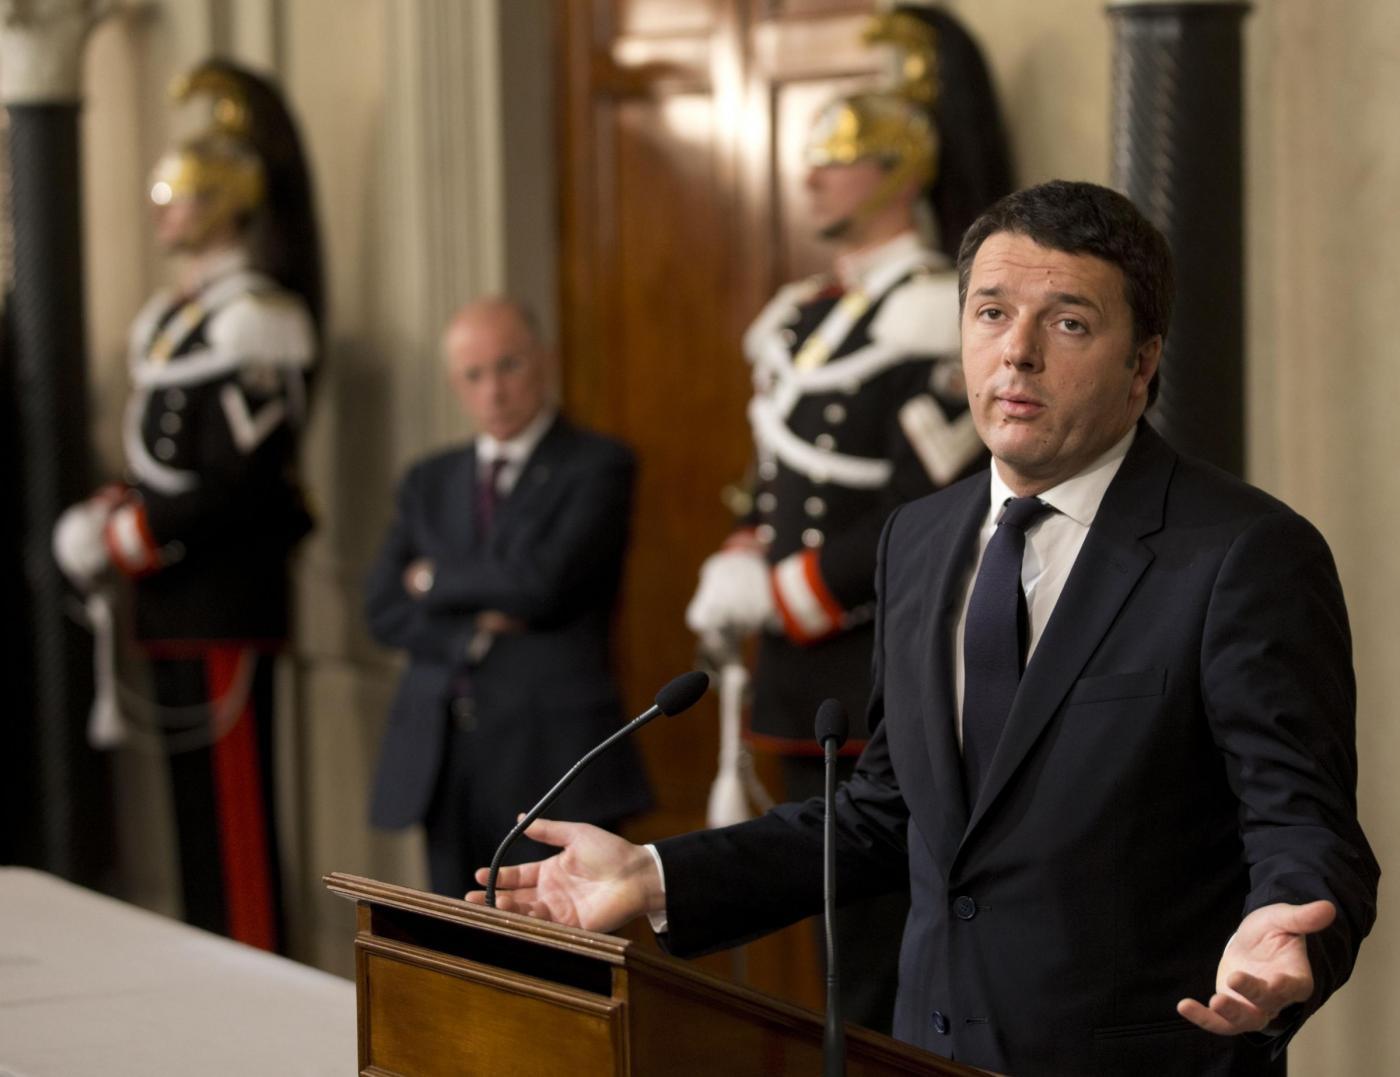 http://www.giornalettismo.com/wp-content/uploads/2014/02/governo-renzi-21.jpg